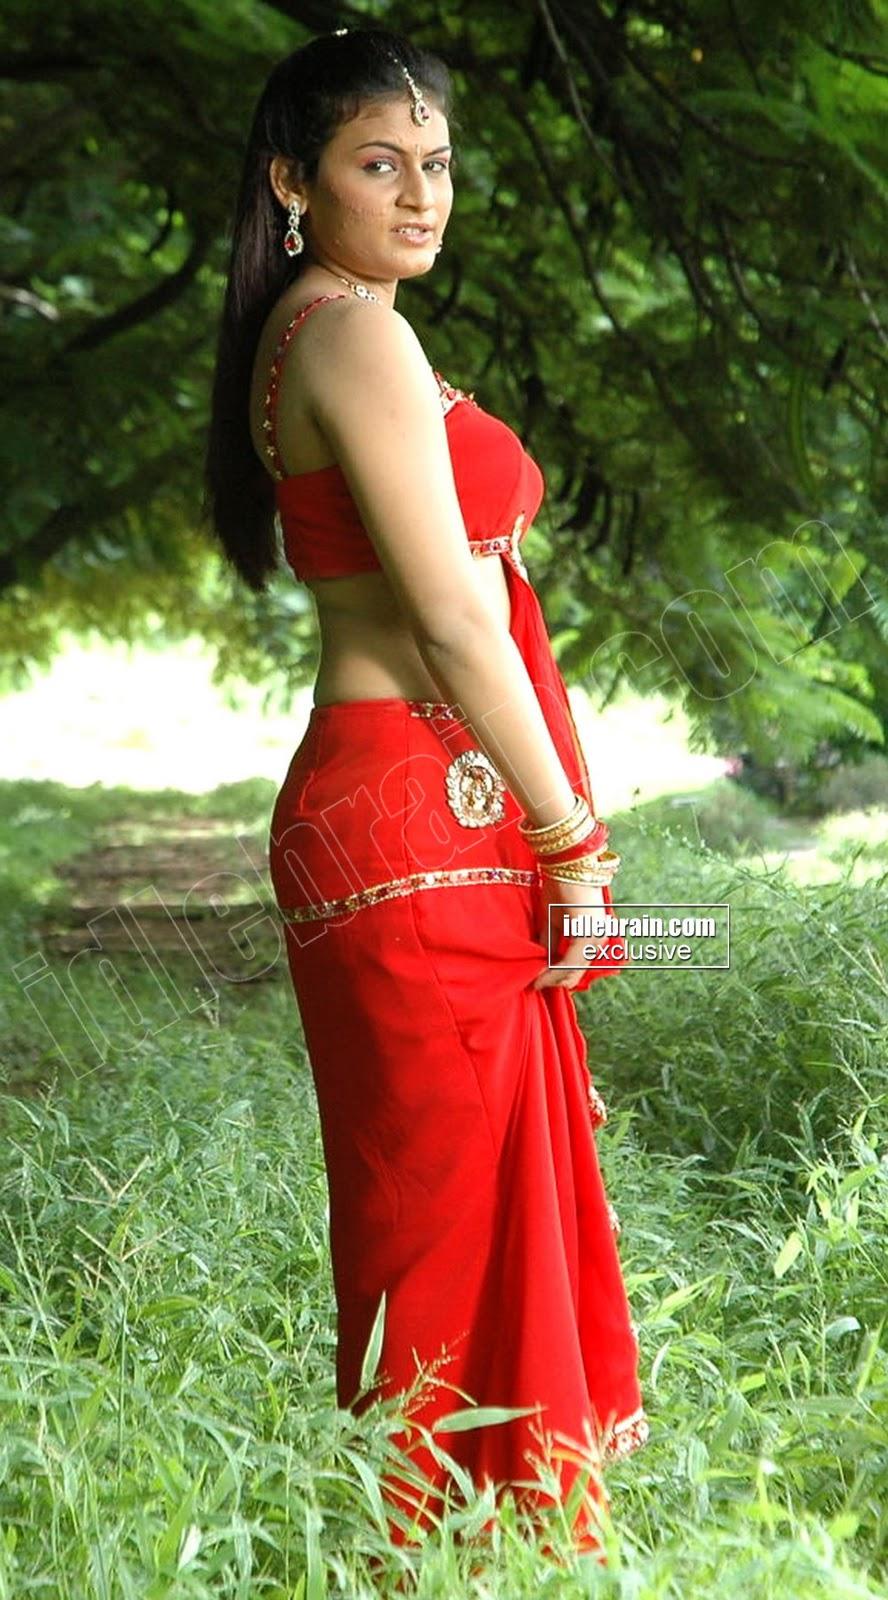 tamil desi masala photos